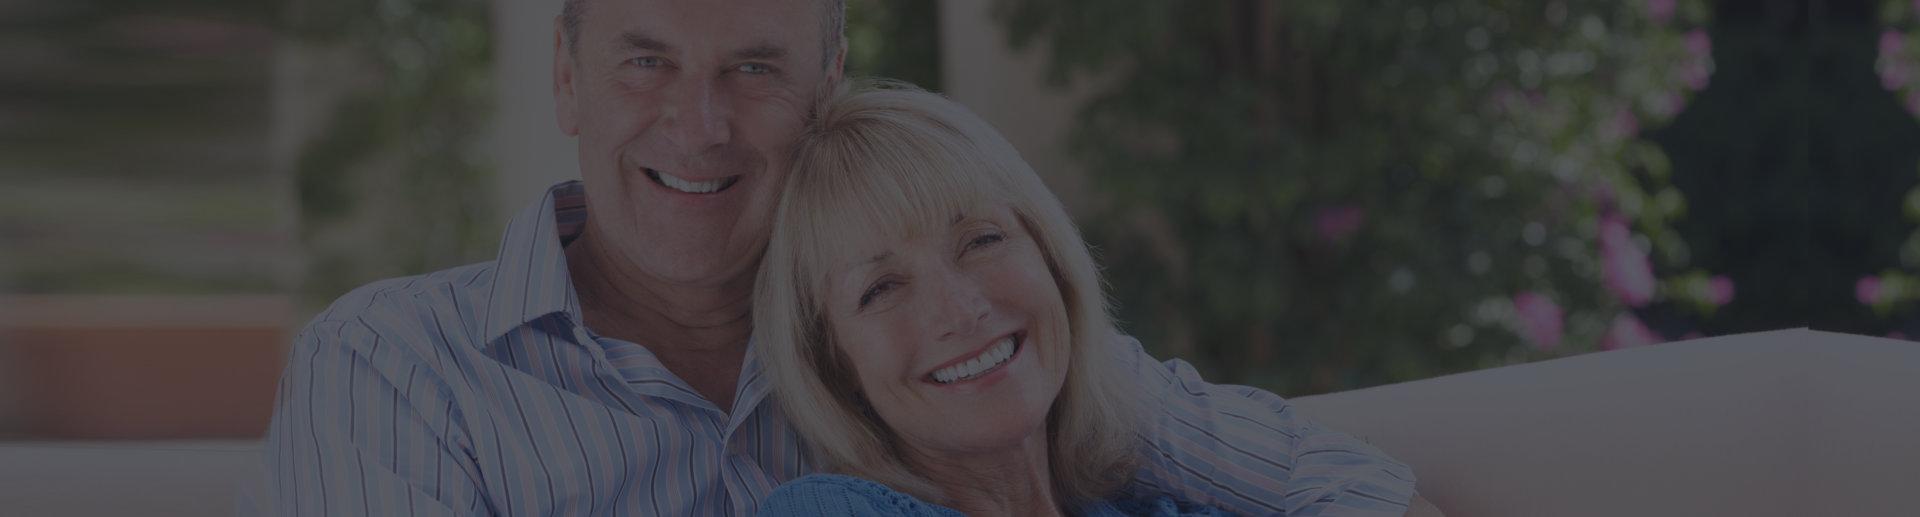 Whitestone Dental - New York - Dr Robert Olan DDS, PC - Periodontics and Dental Implants - Slider 1